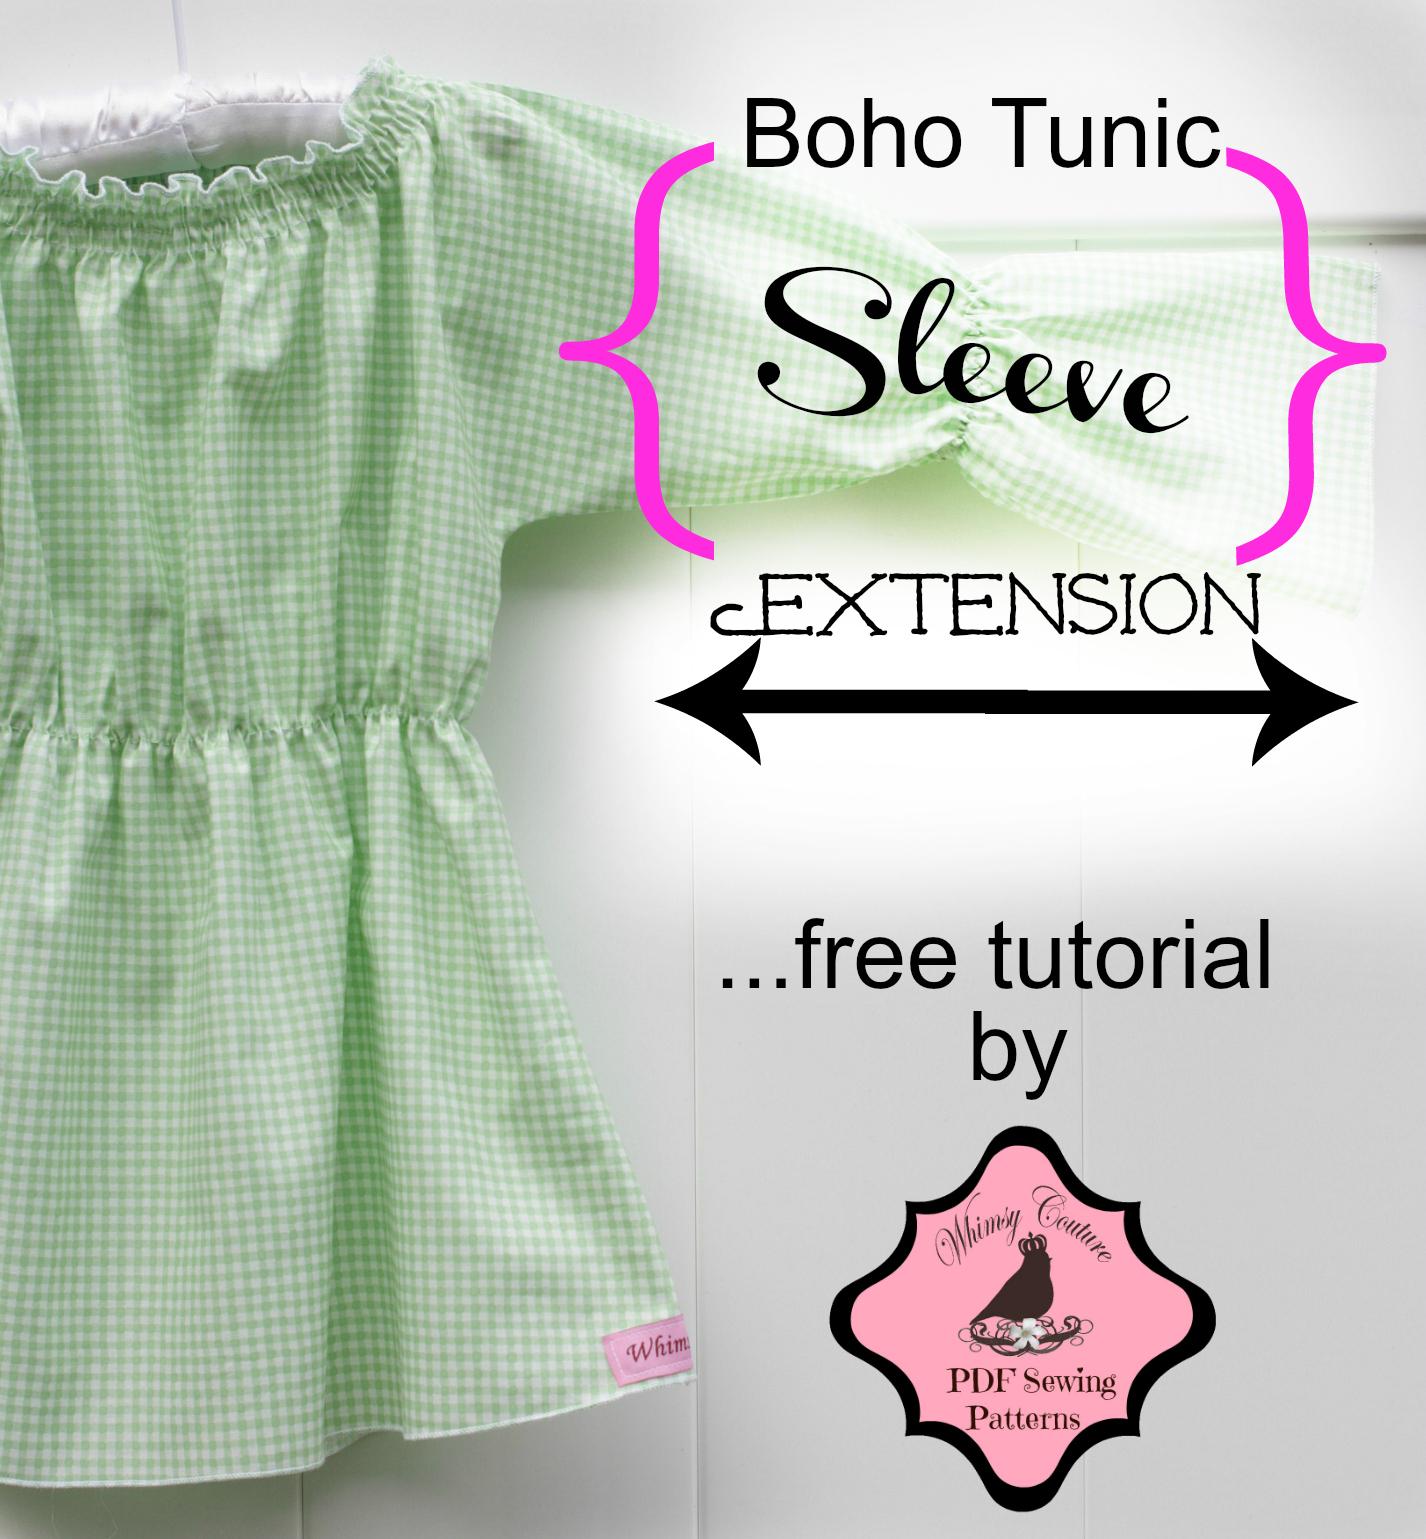 Boho Tunic Pattern Free Tutorial – Boho Tunic